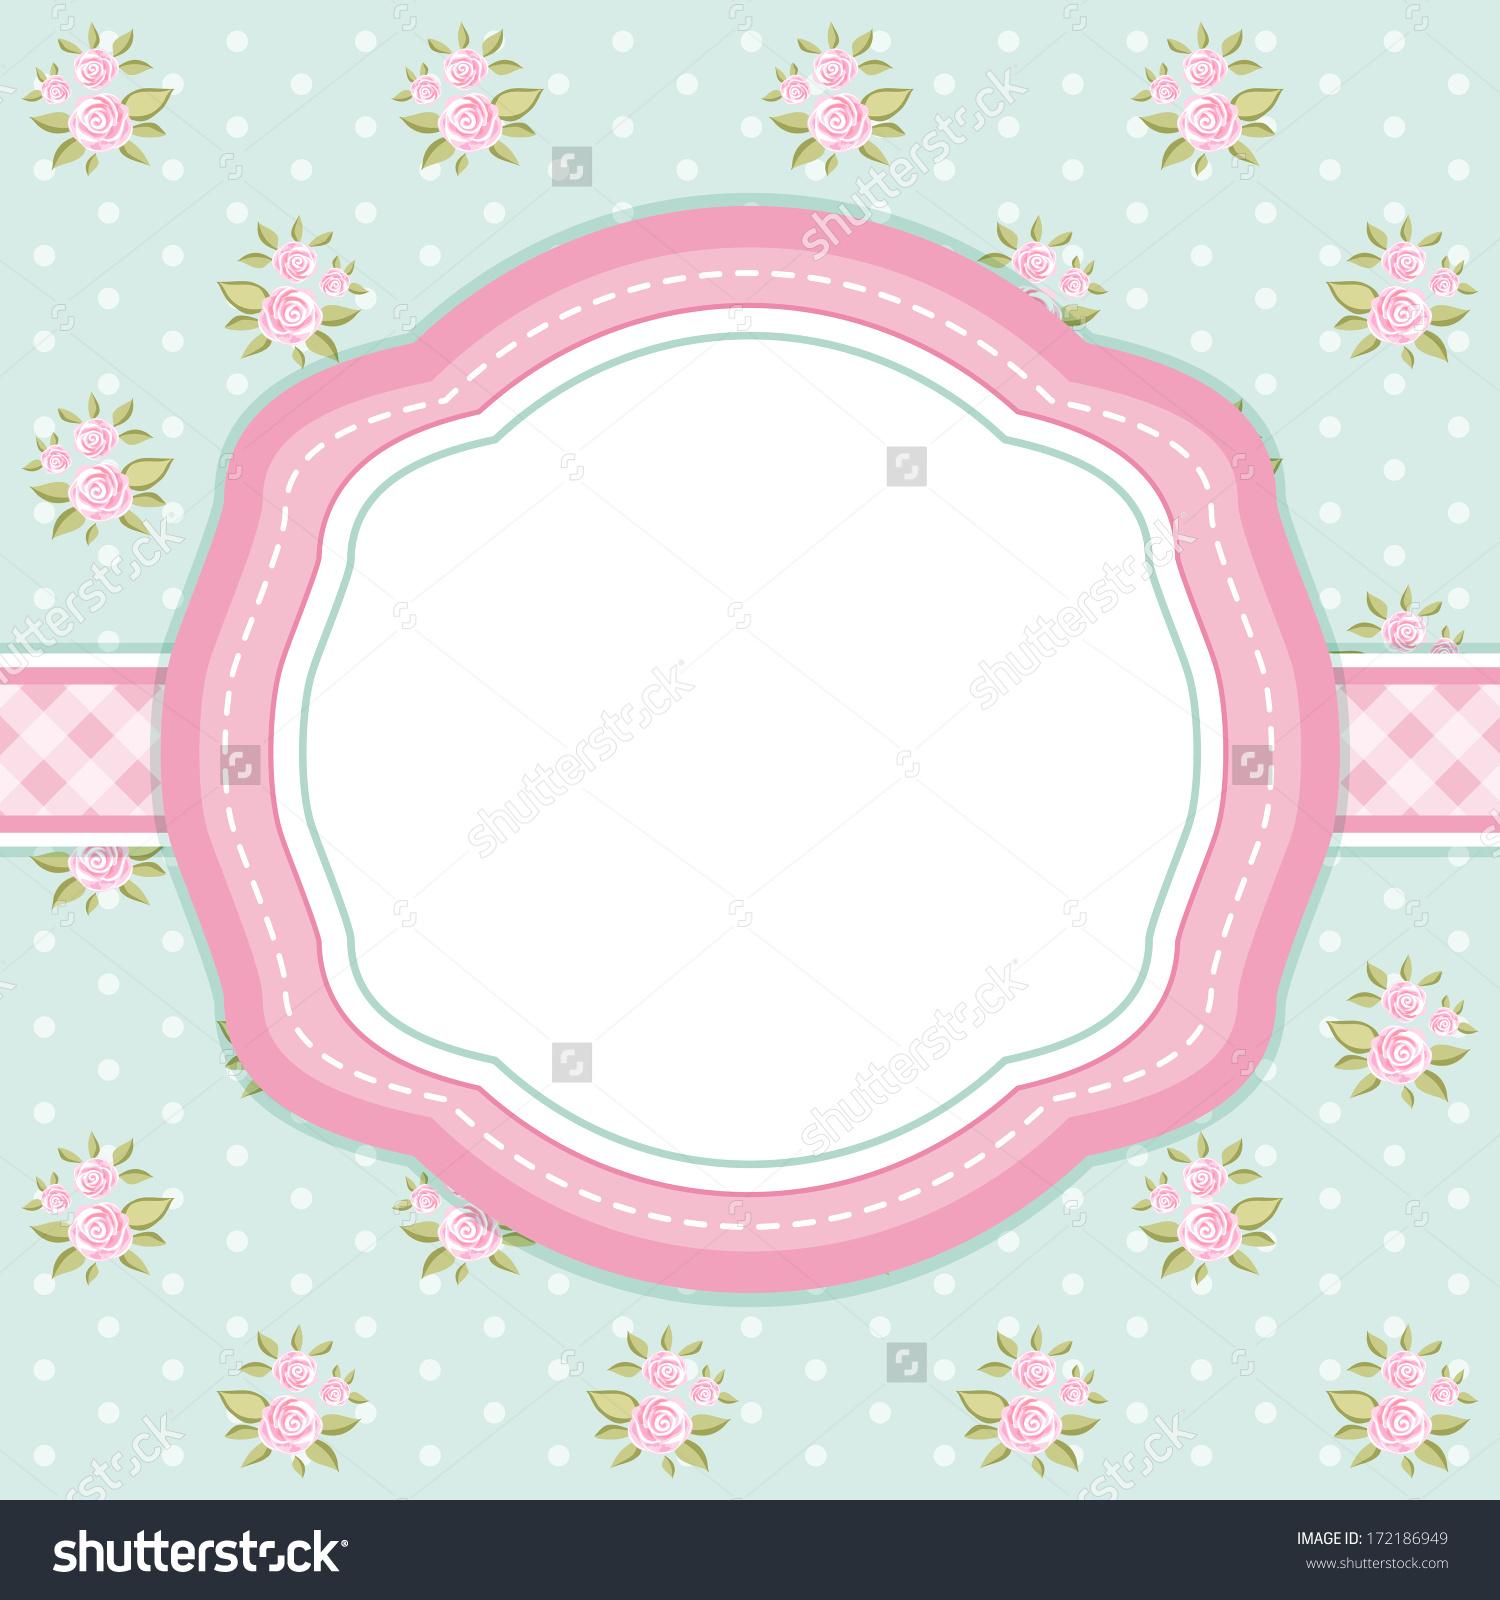 Retro Card Oval Frame On Shabby Stock Illustration 172186949.